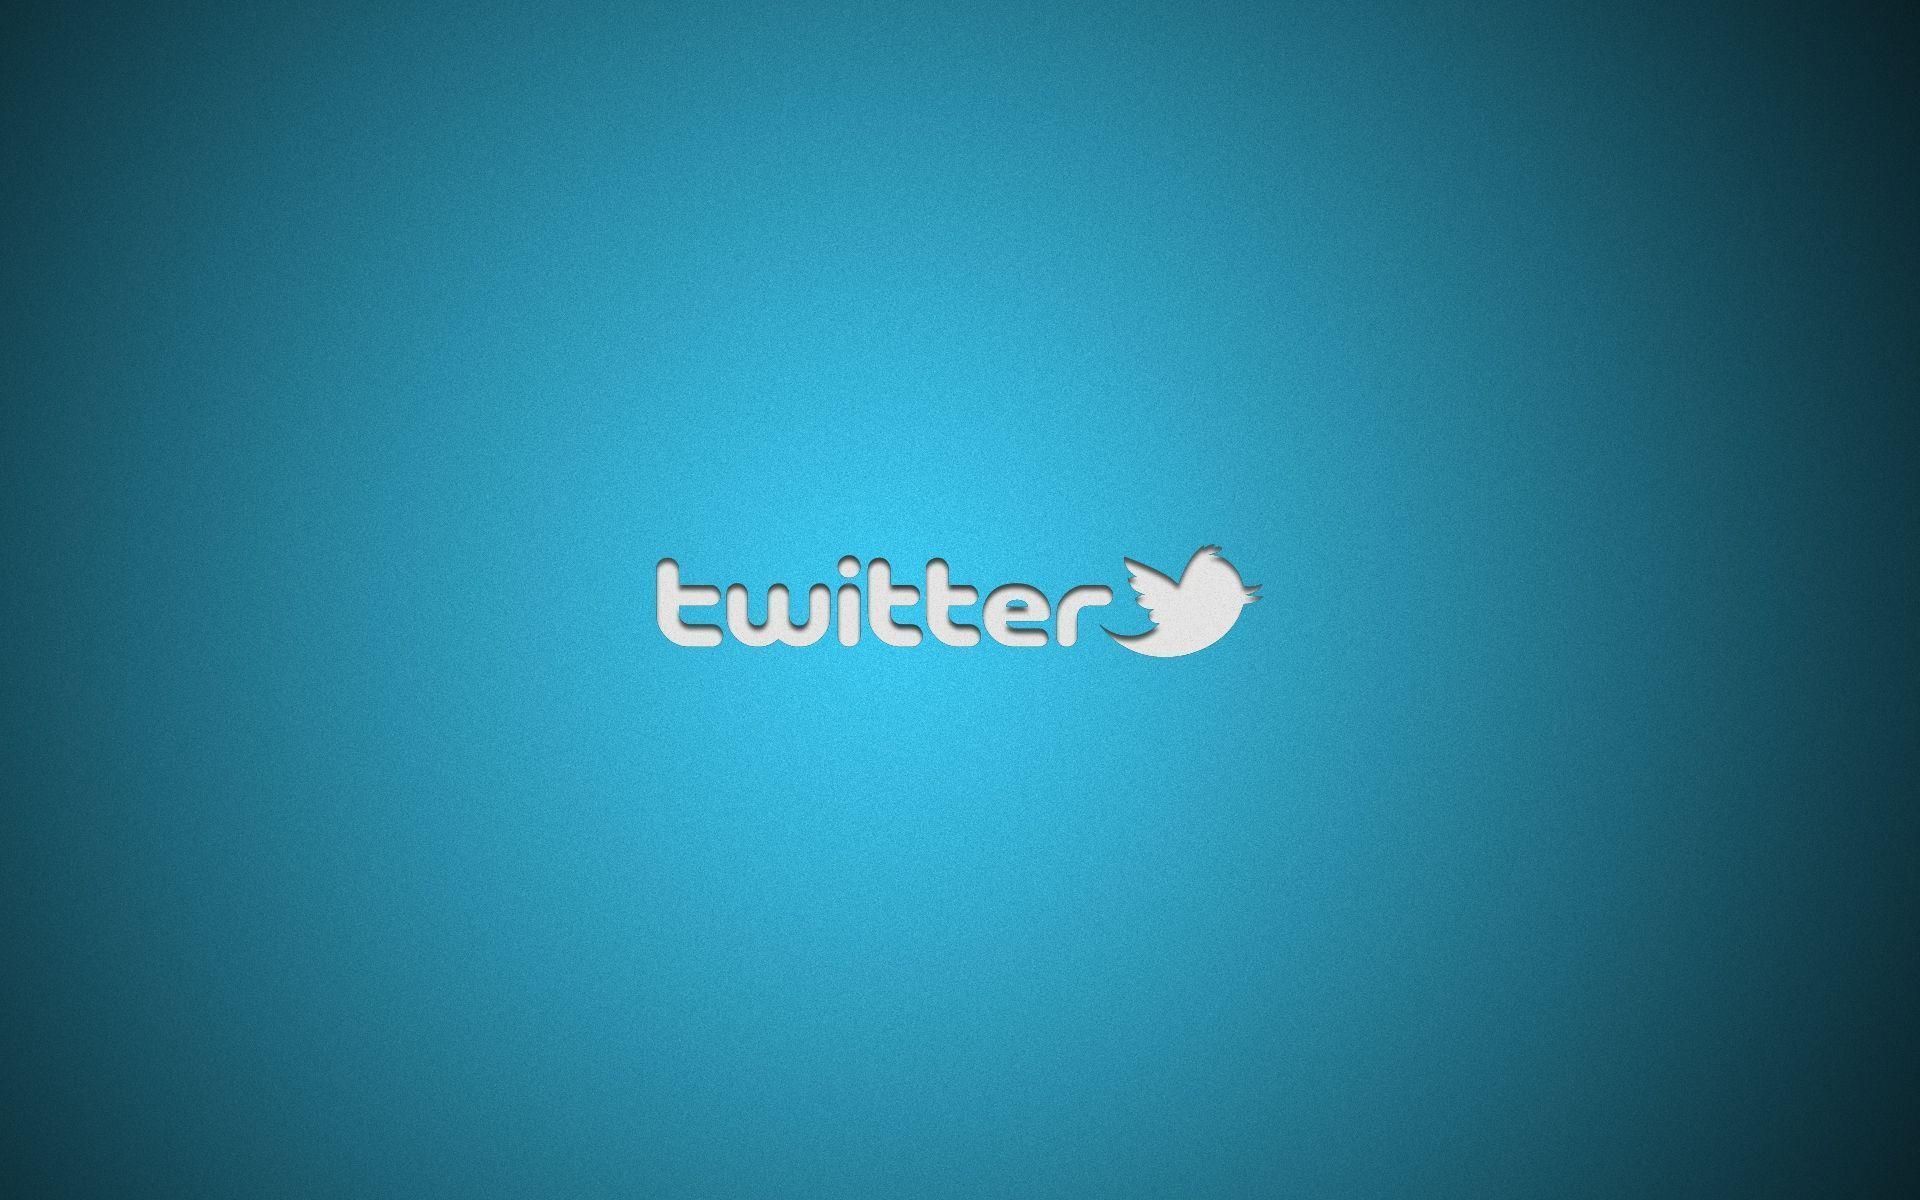 Twitter Logo Wallpapers Wallpaper Cave